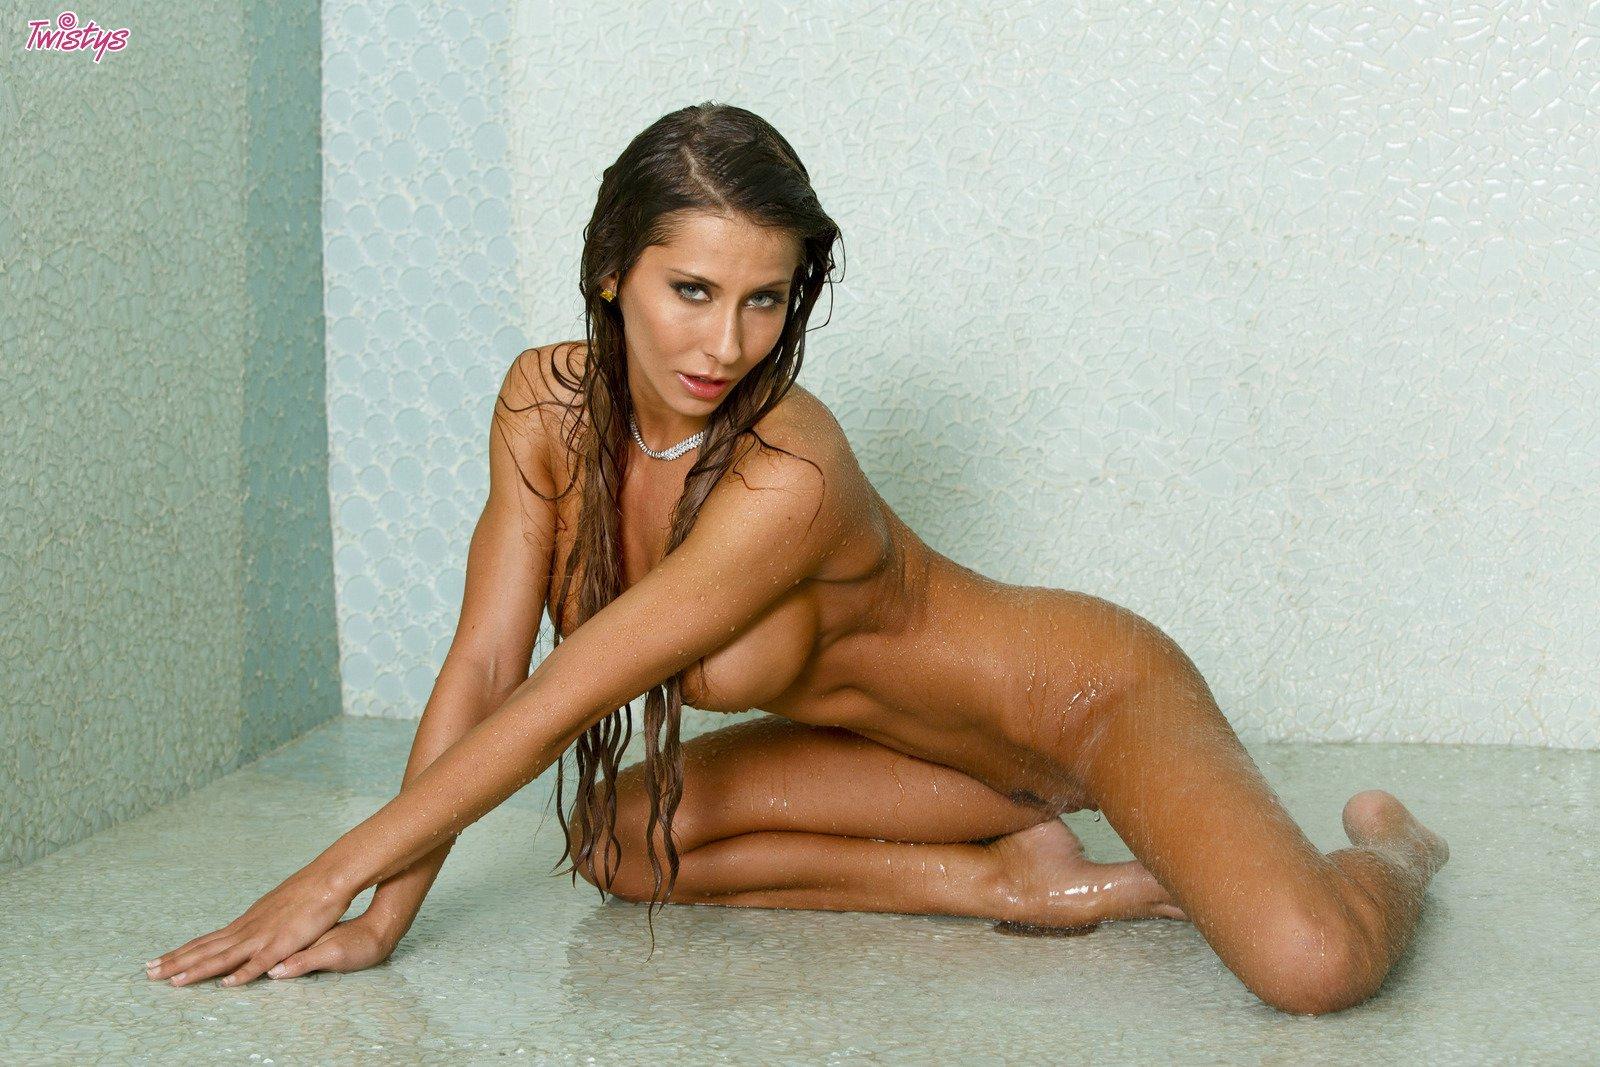 madison ivy shower